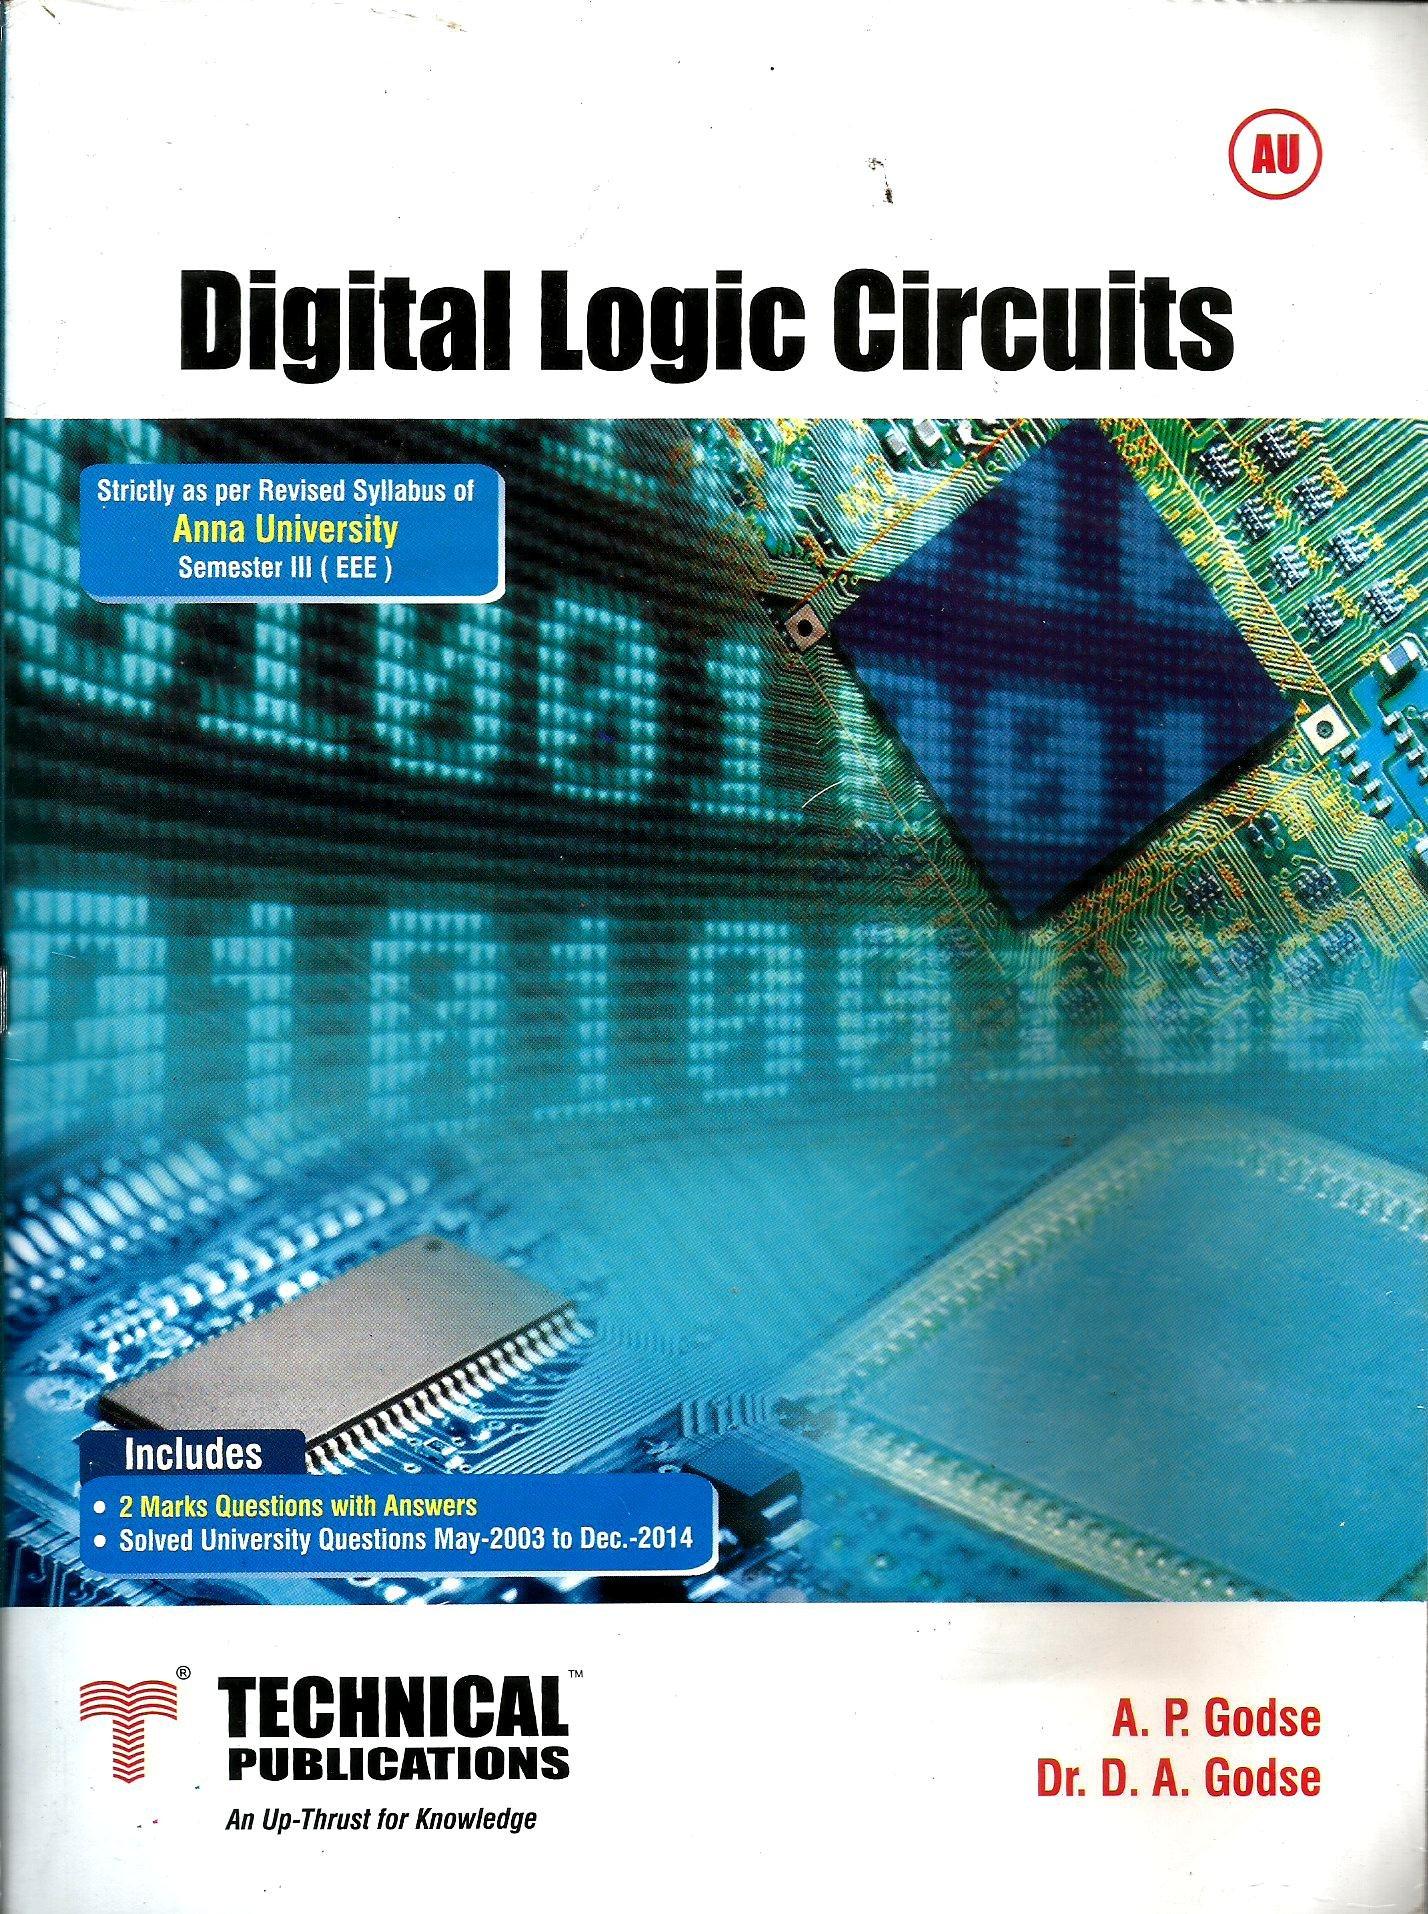 EE6301 Digital Logic Circuits